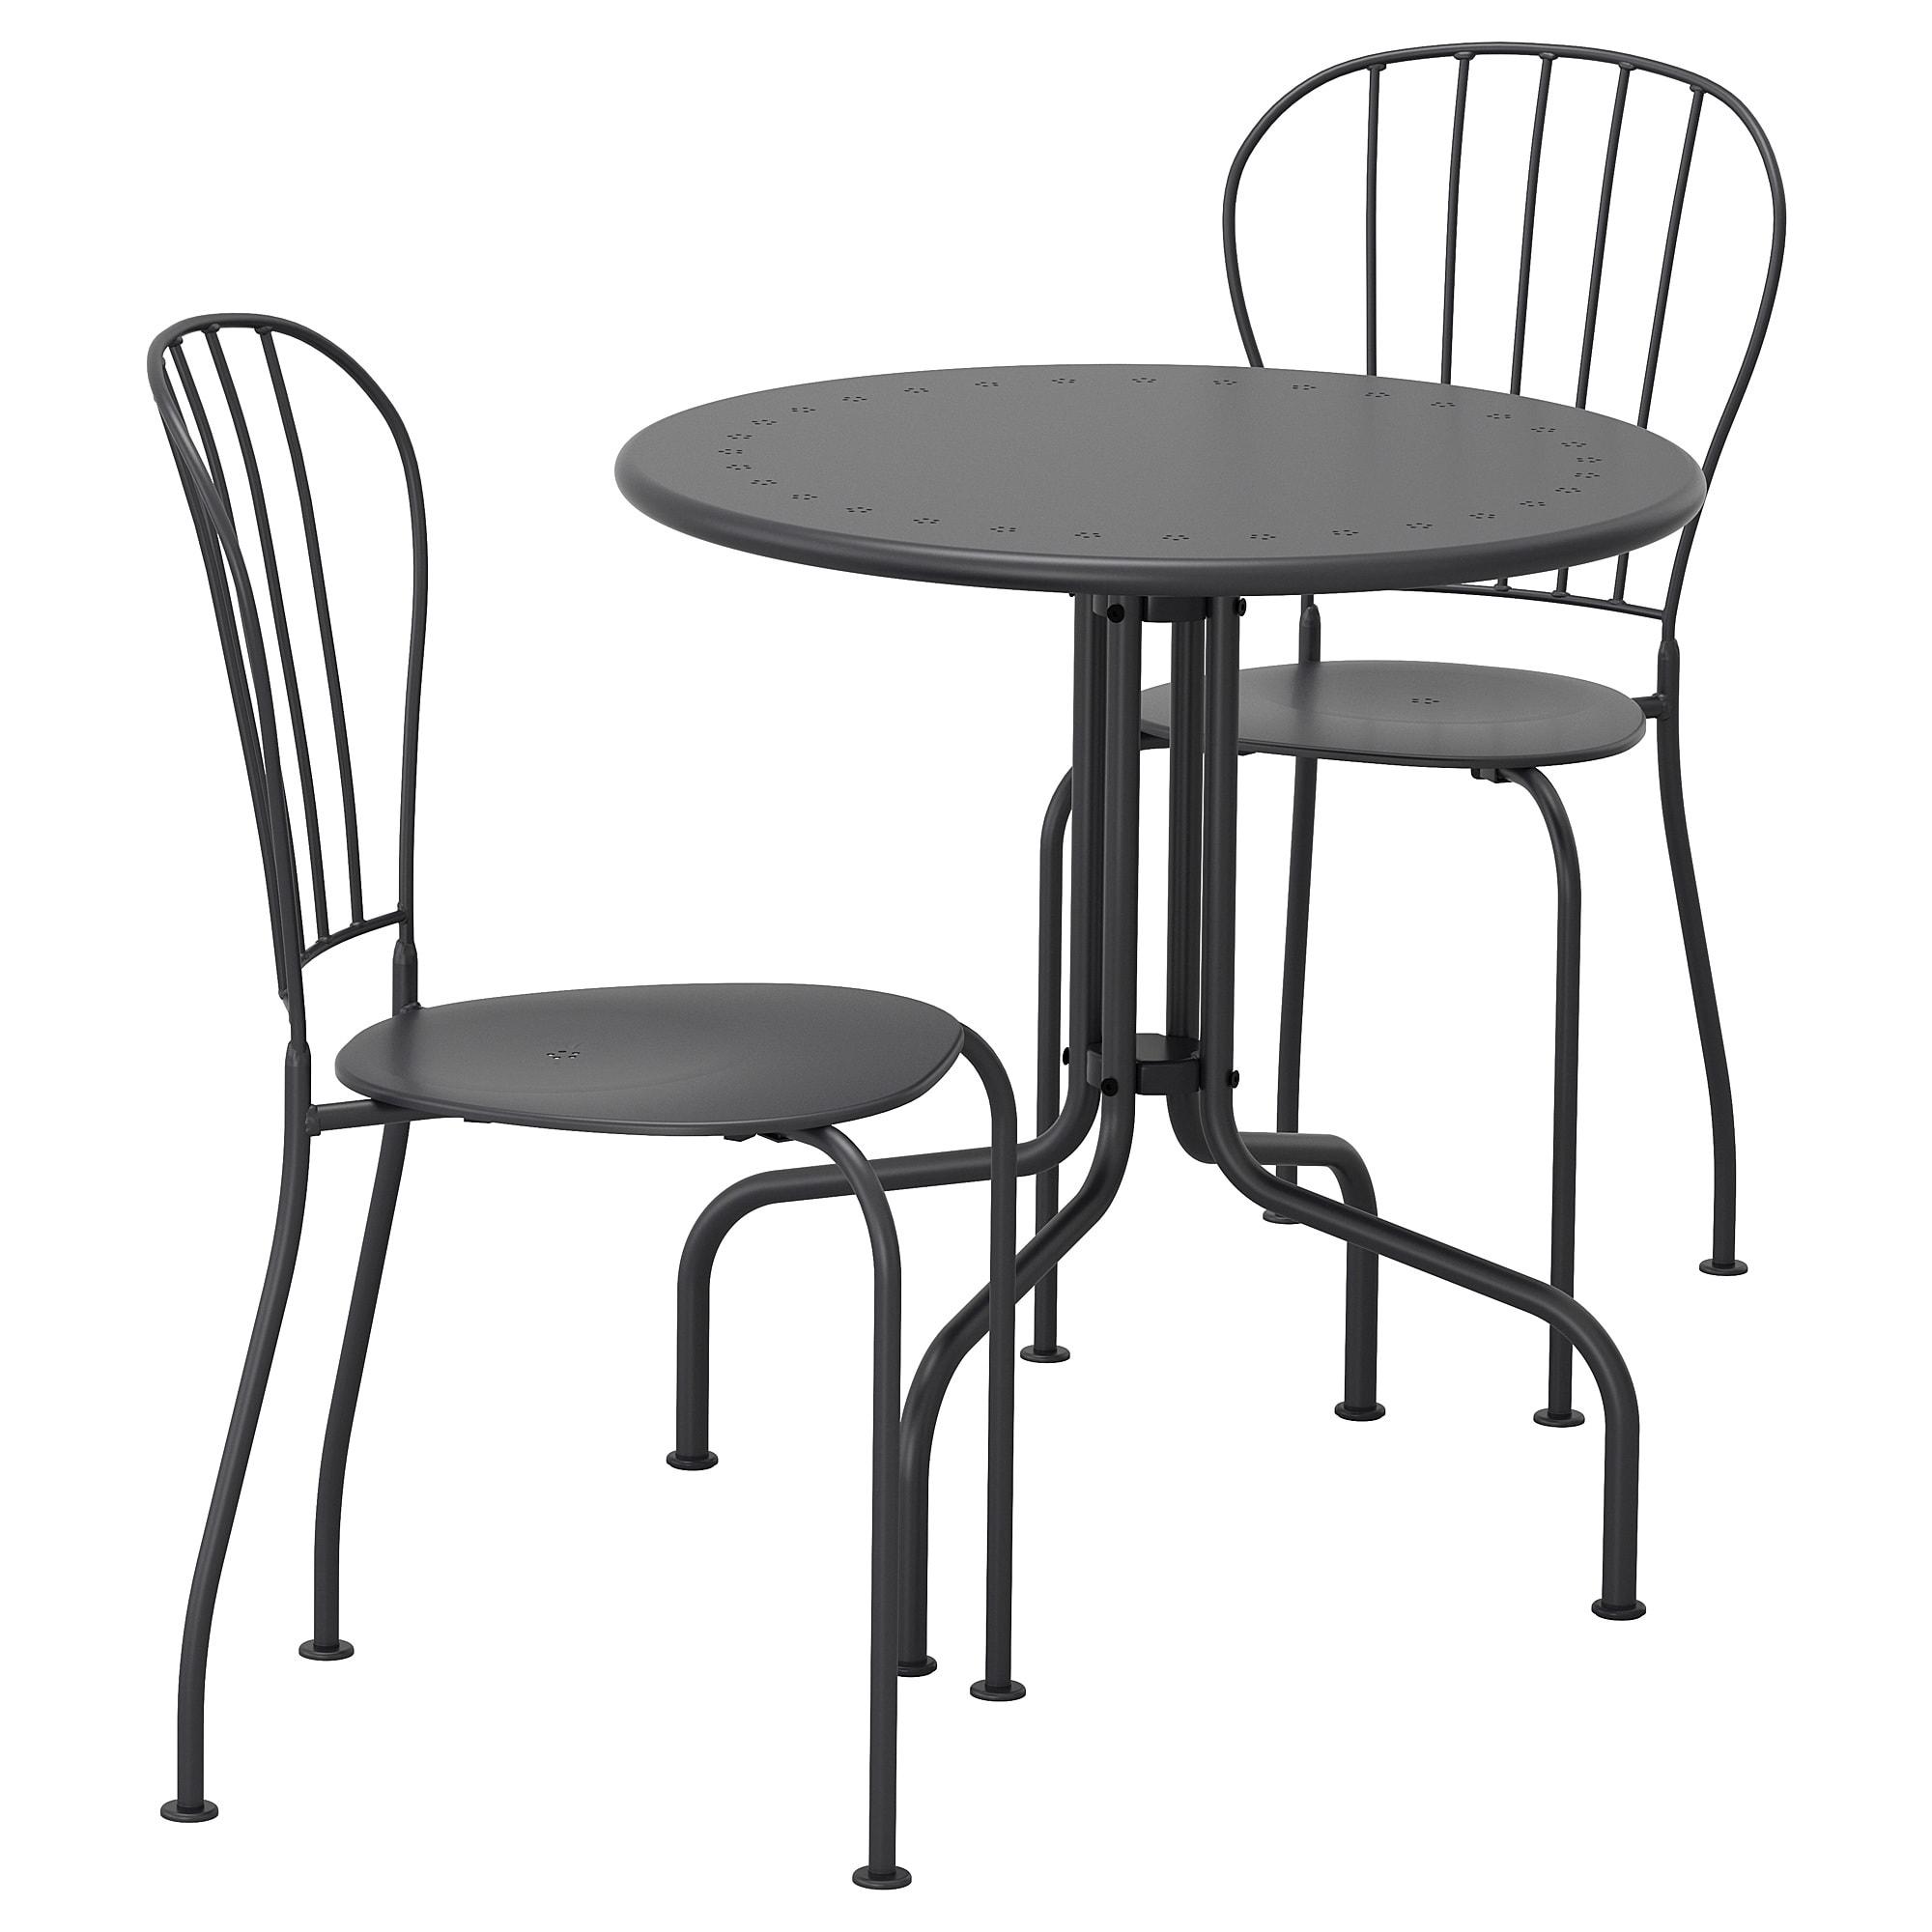 Lacko Bistro Set Outdoor Gray Ikea Ikea Outdoor Furniture Used Outdoor Furniture Rustic Outdoor Furniture